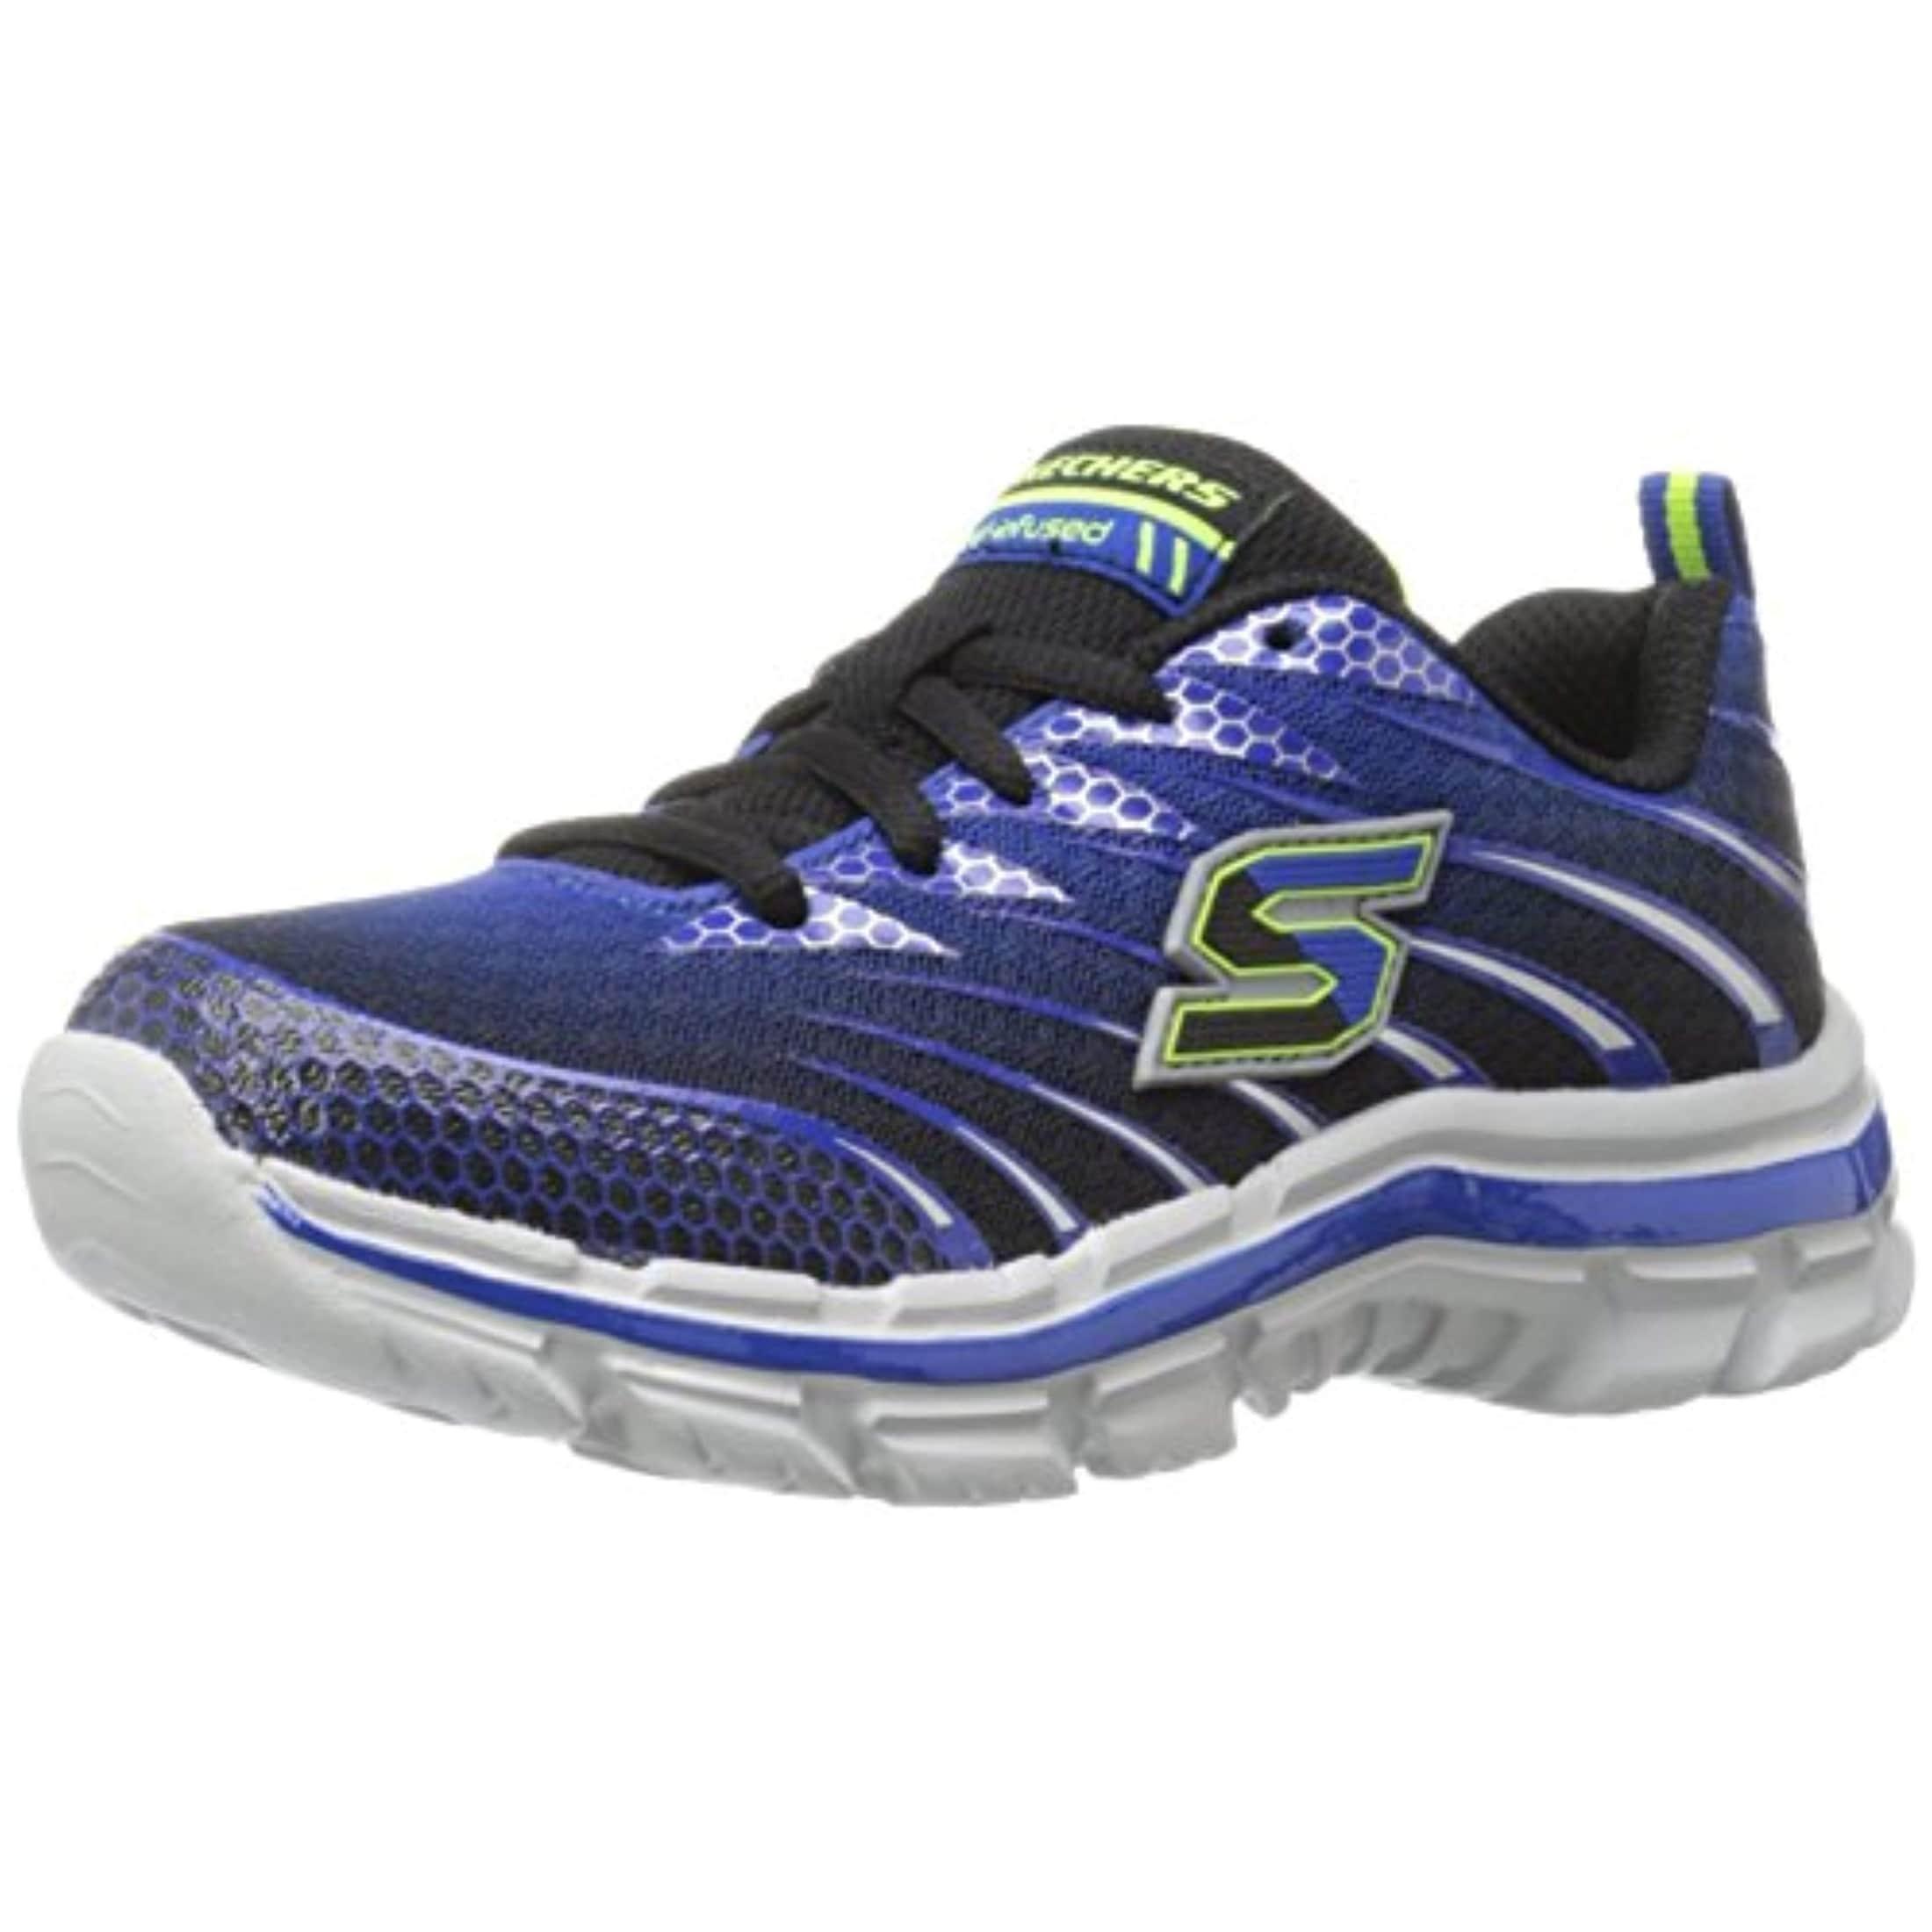 f1235a82b8b3 Shop Skechers Boys  Nitrate Training Shoe